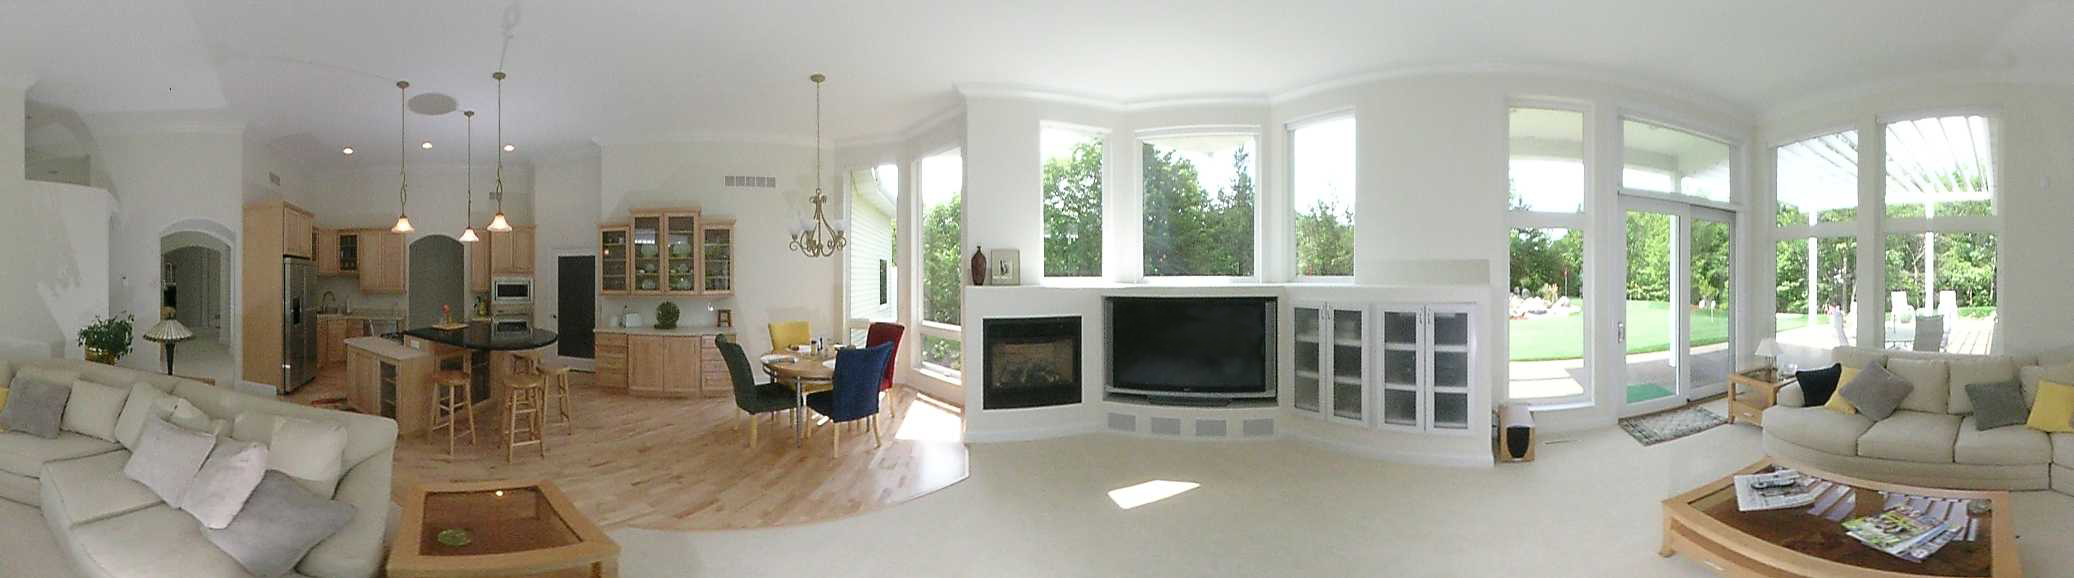 Панорамное фото квартиры